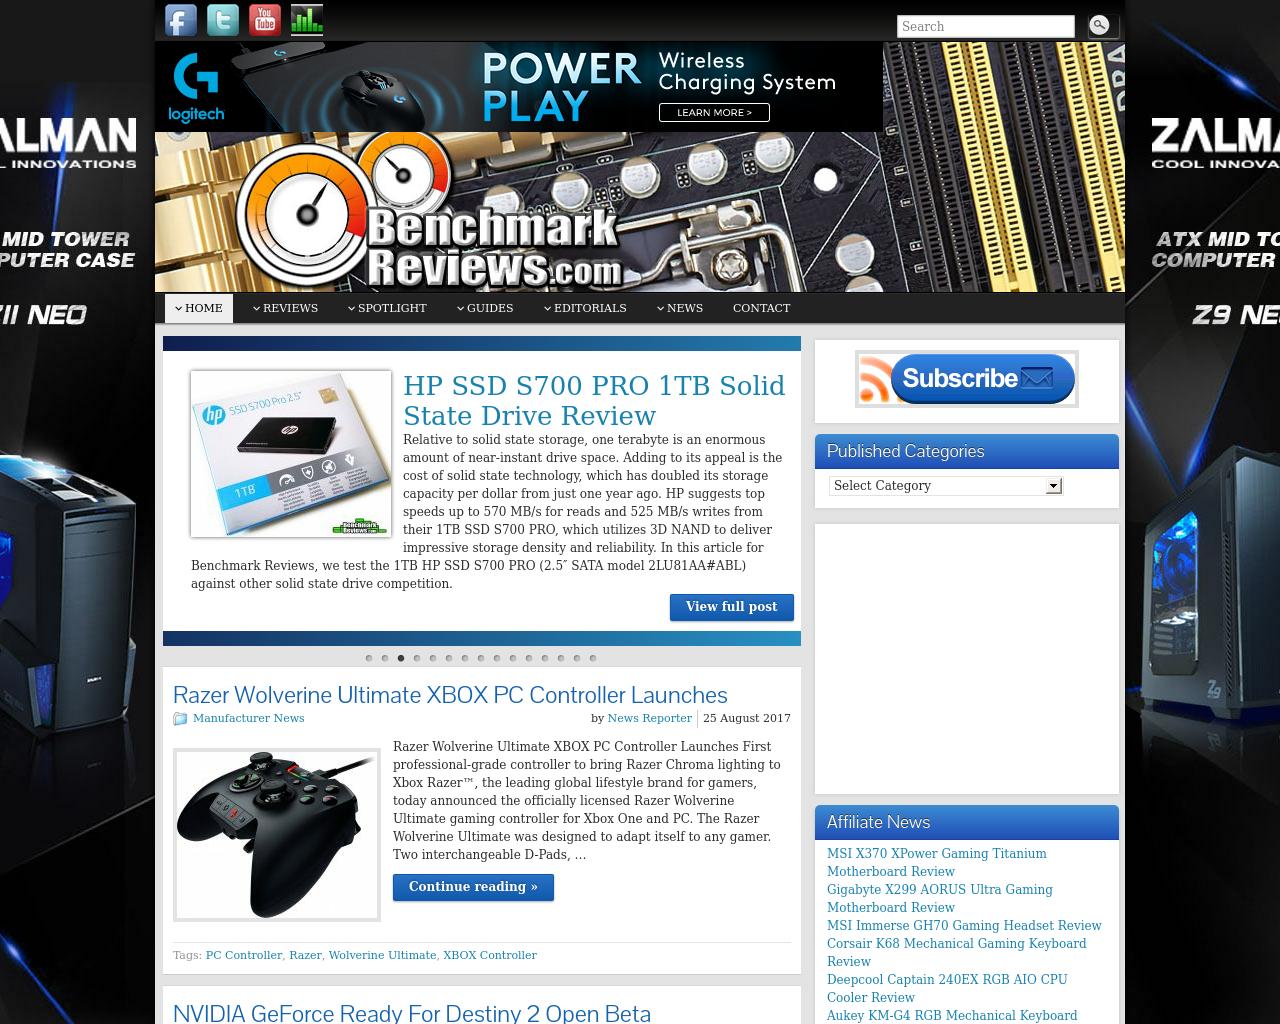 Benchmark-Reviews-Advertising-Reviews-Pricing